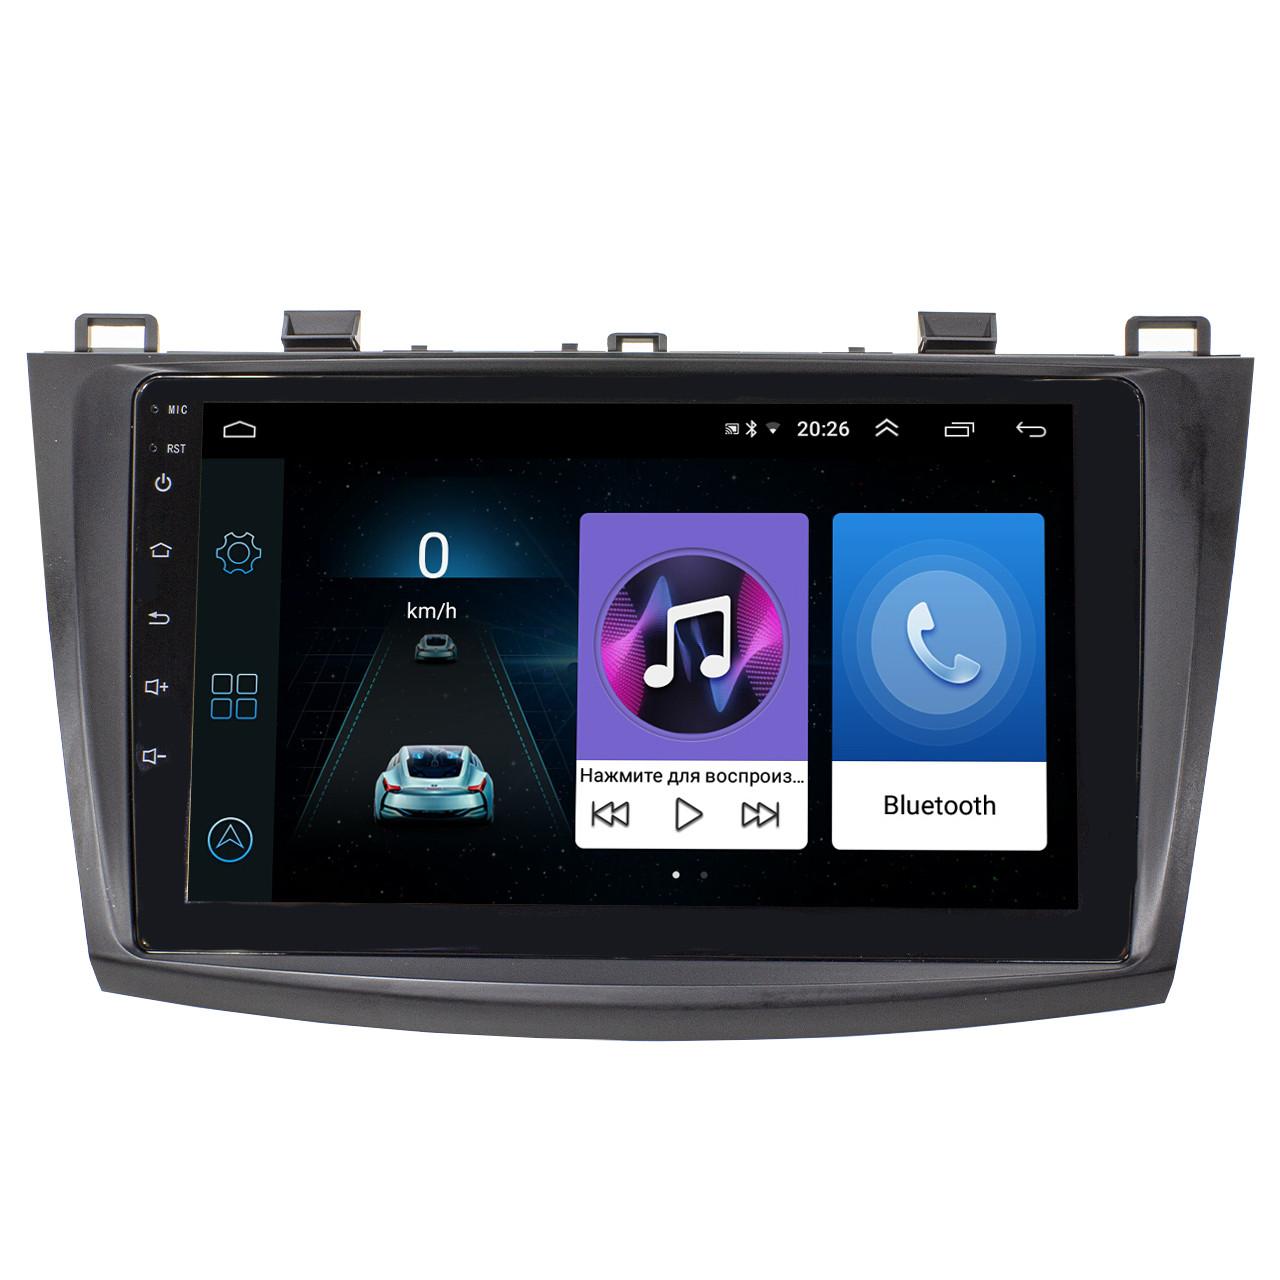 "Штатная магнитола для автомобиля Mazda 3 (2009-2013) 9"" сенсор 1/16 Гб GPS навигация FM USB вход Wi Fi"